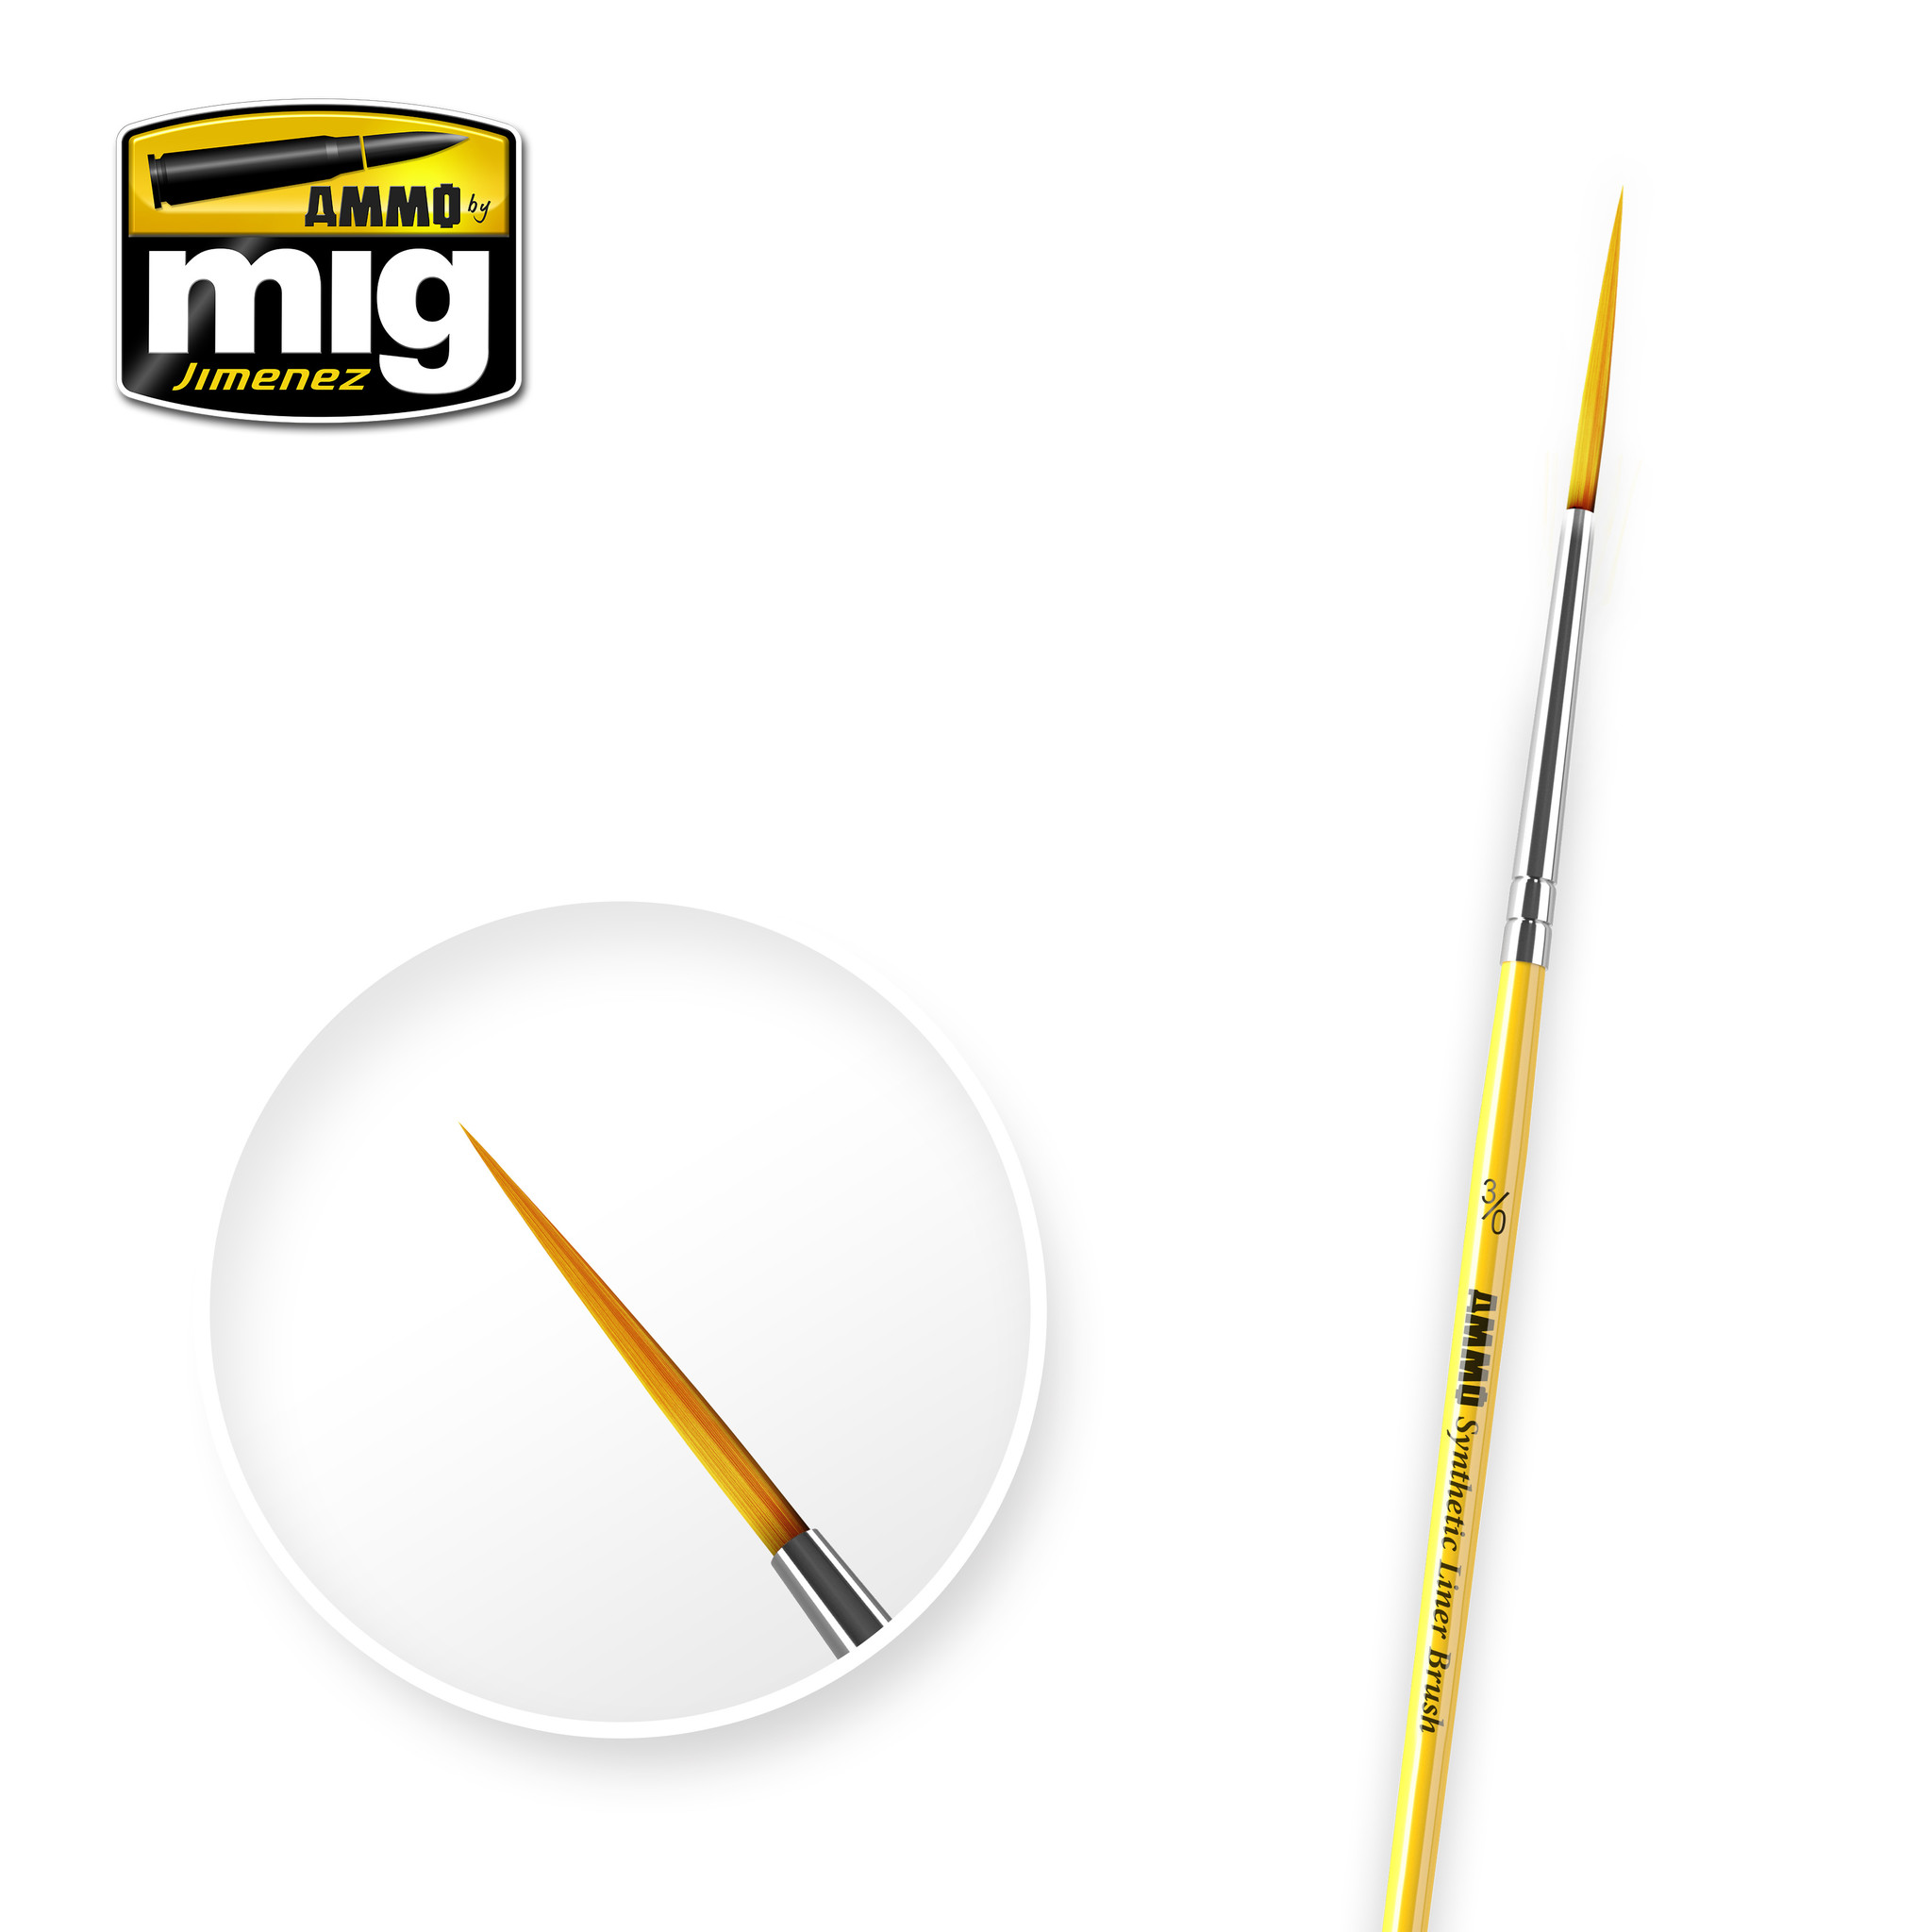 Ammo by Mig Jimenez 3/0 Syntetic Liner Brush - A.MIG-8590